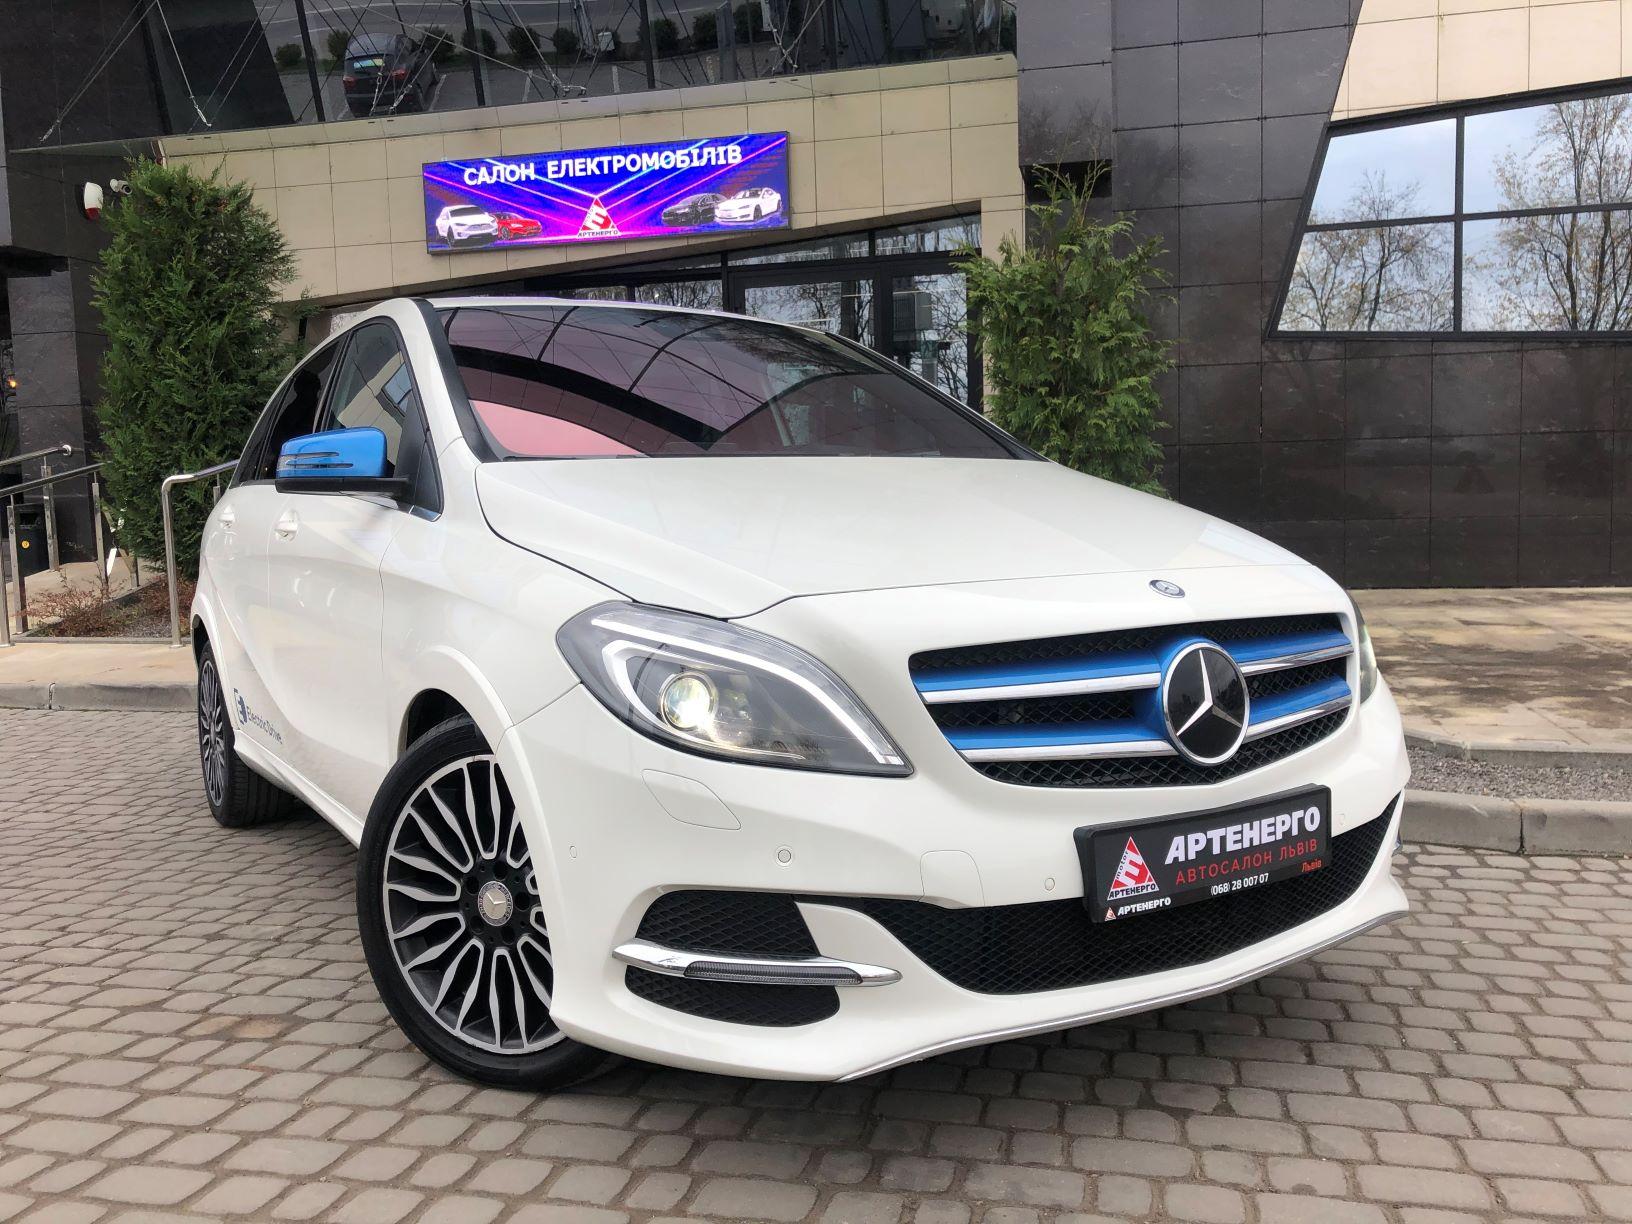 Mercedes-Benz-electric-drive-artenergomotor